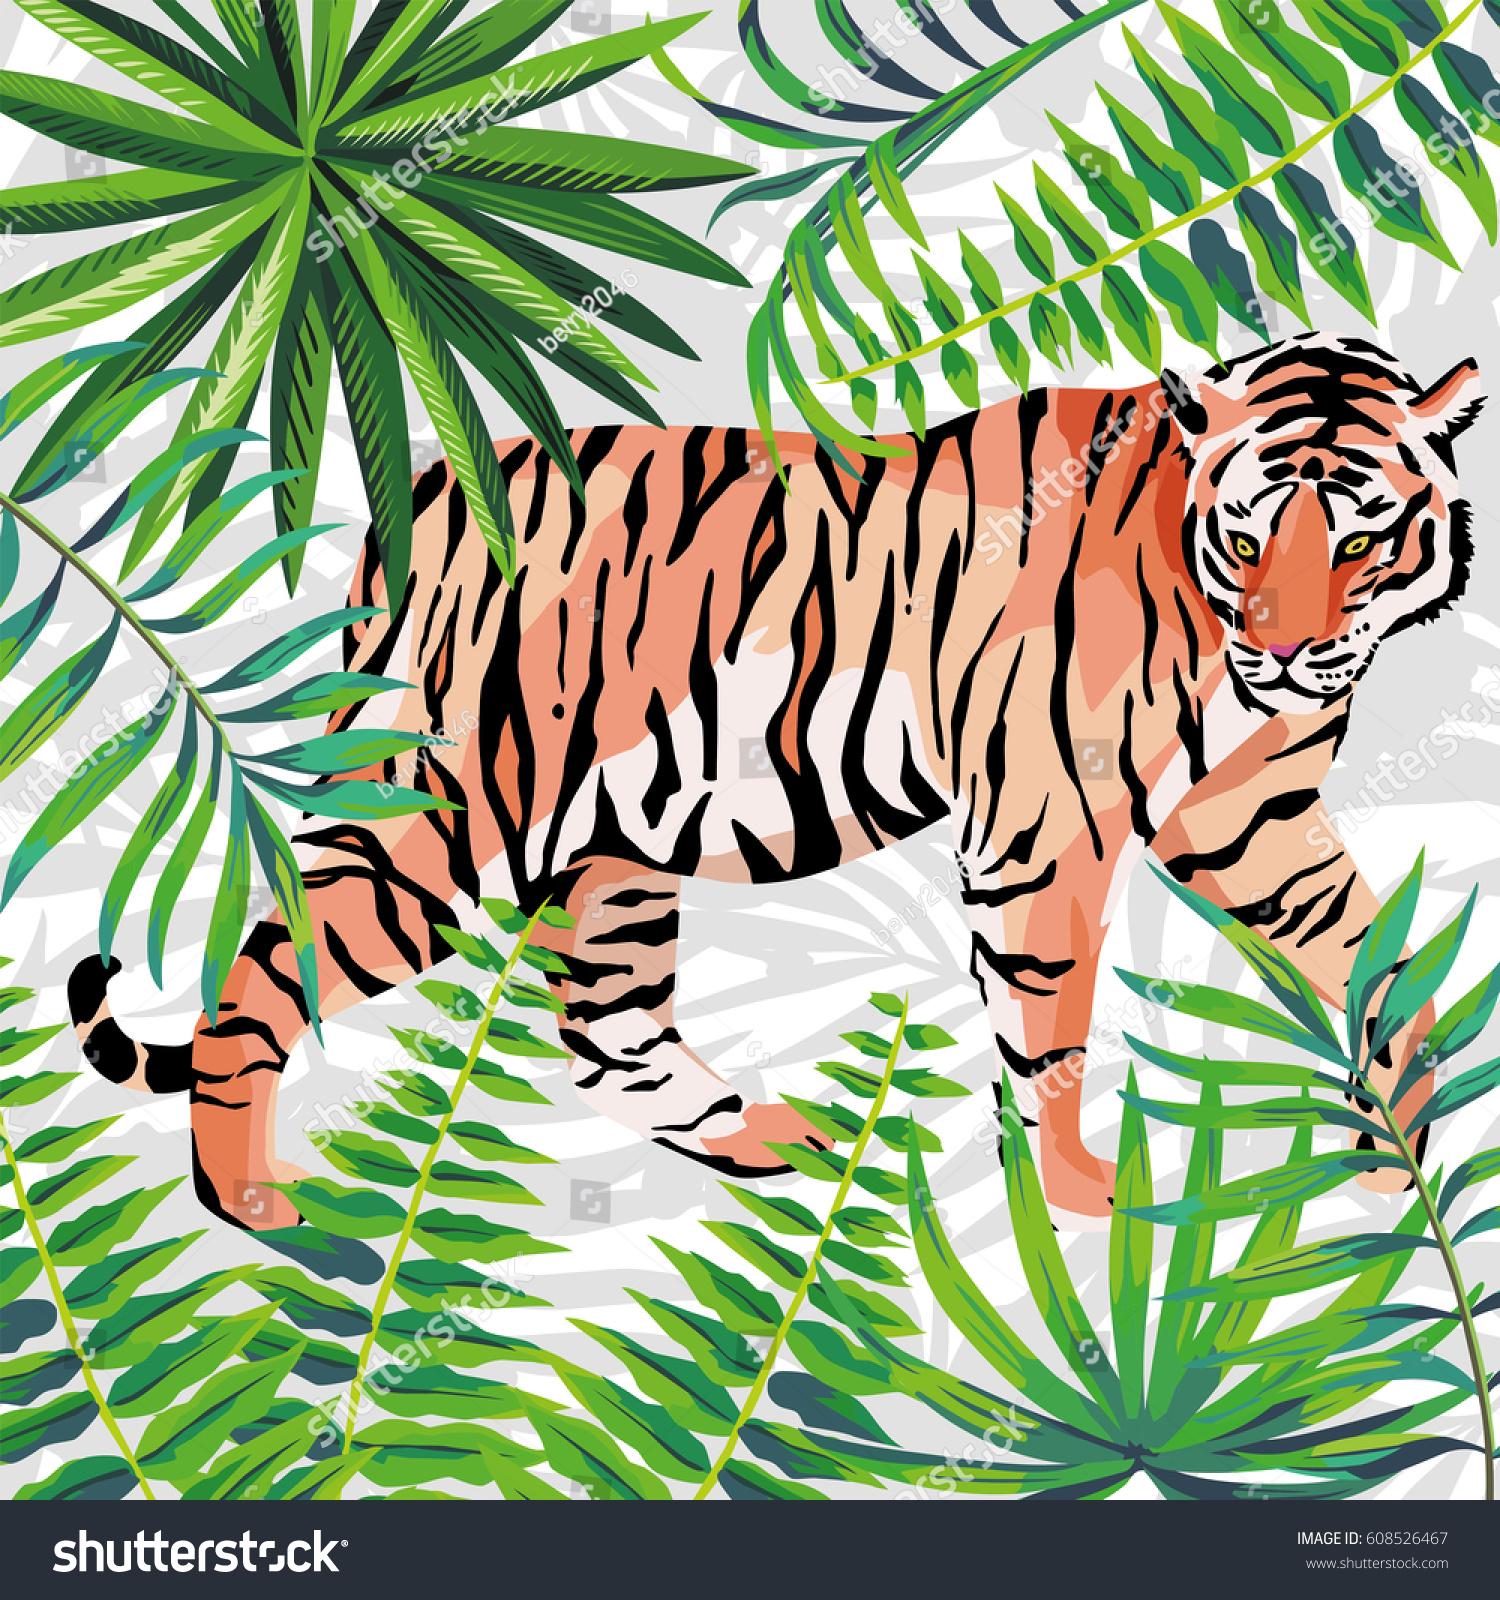 Walking Tiger Jungle Green Leaves Beautiful Stock Vector